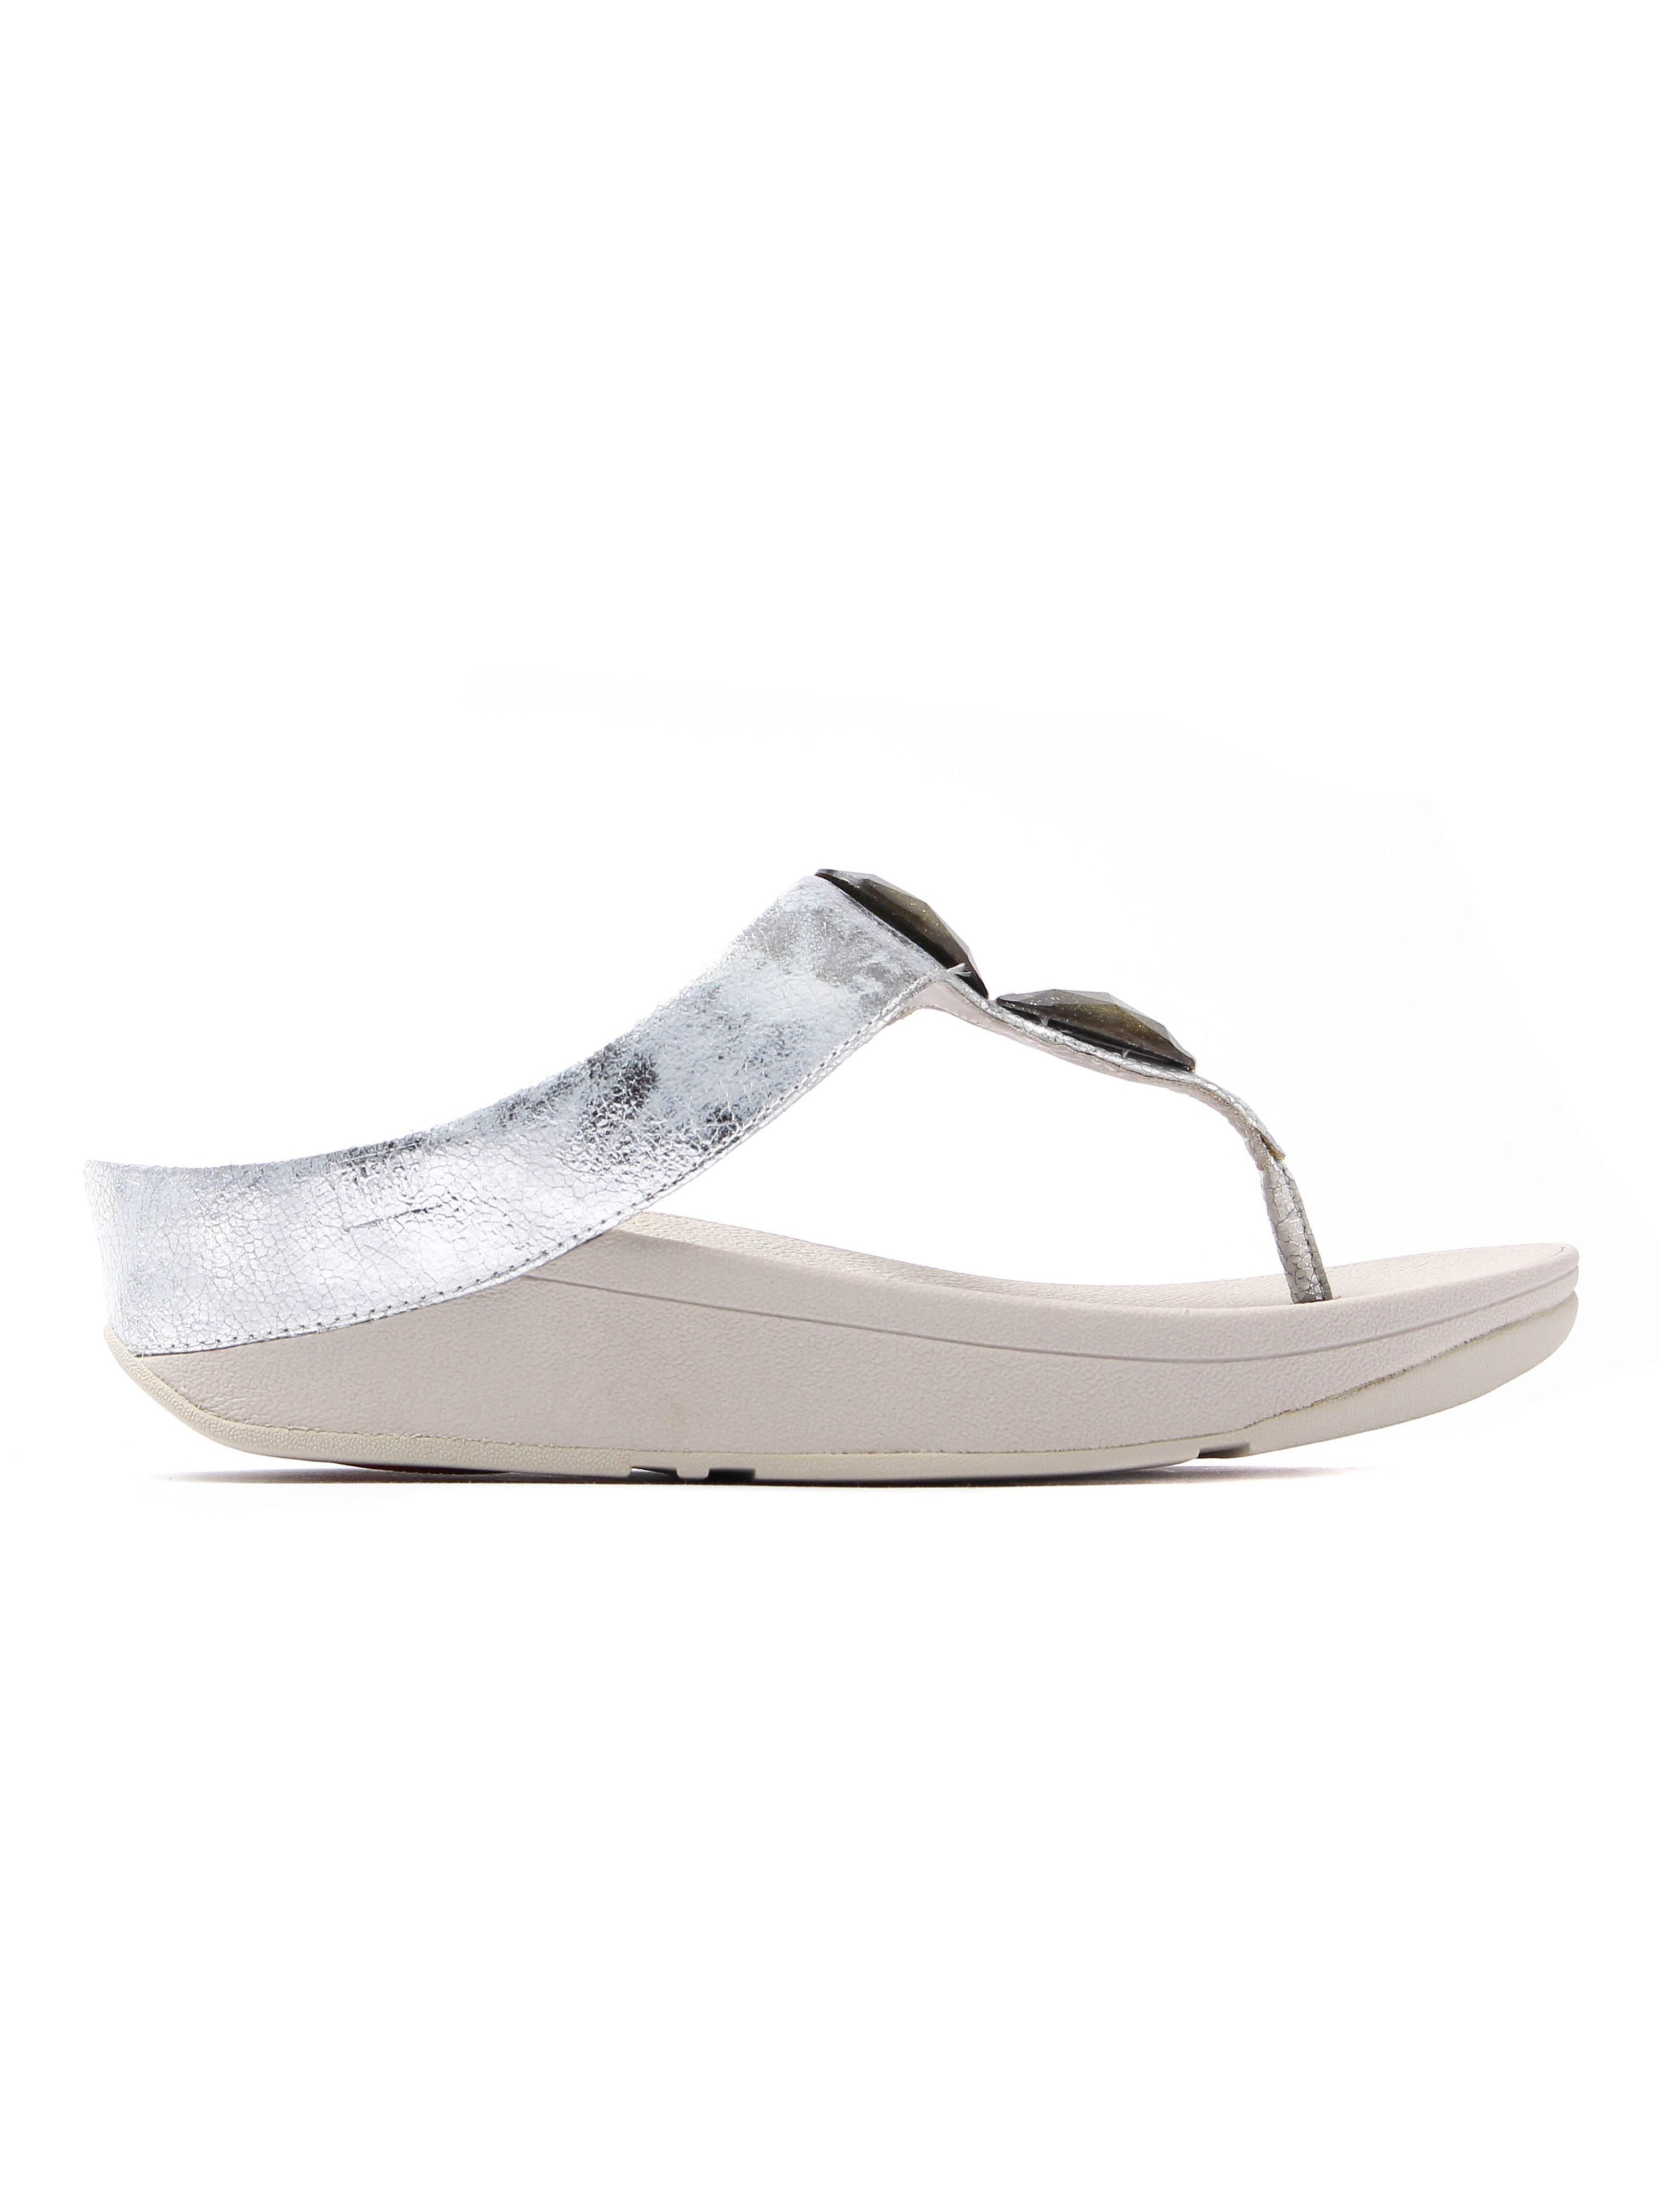 FitFlop Women's Pierra Leather Toe-Post Sandals - Silver